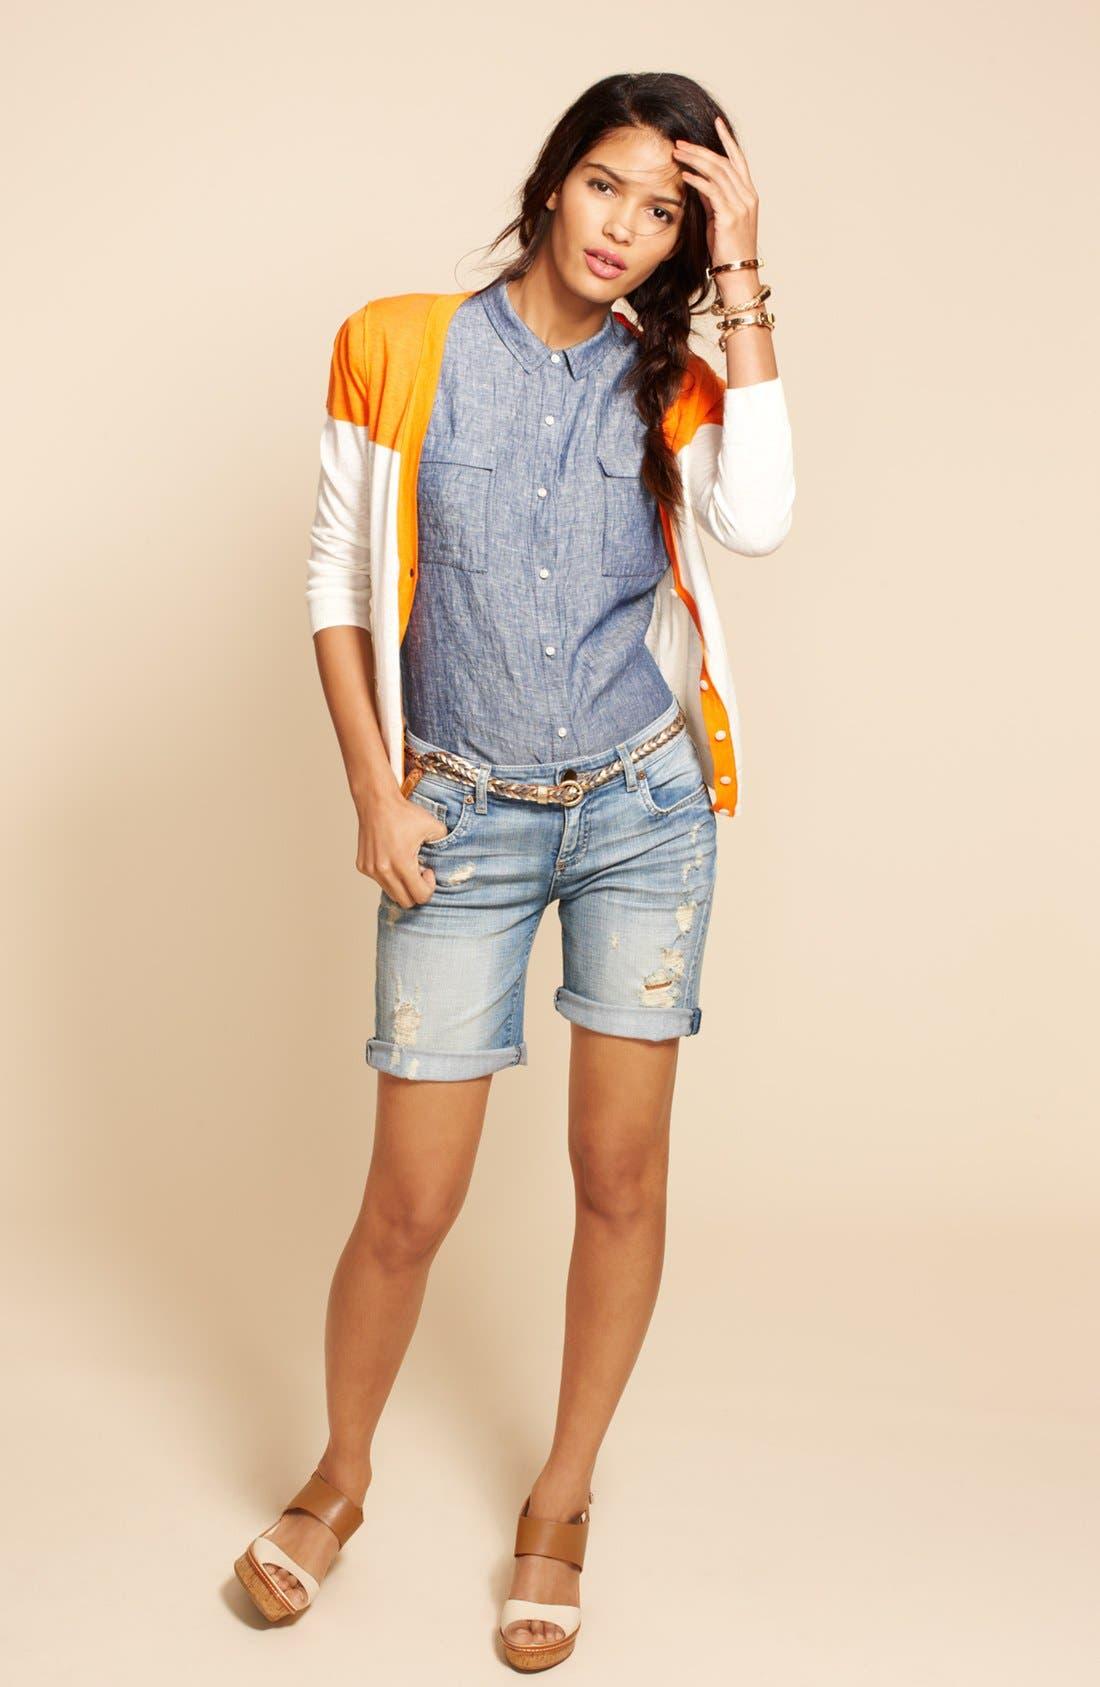 Main Image - Caslon® Cardigan, Top & KUT from the Kloth Shorts